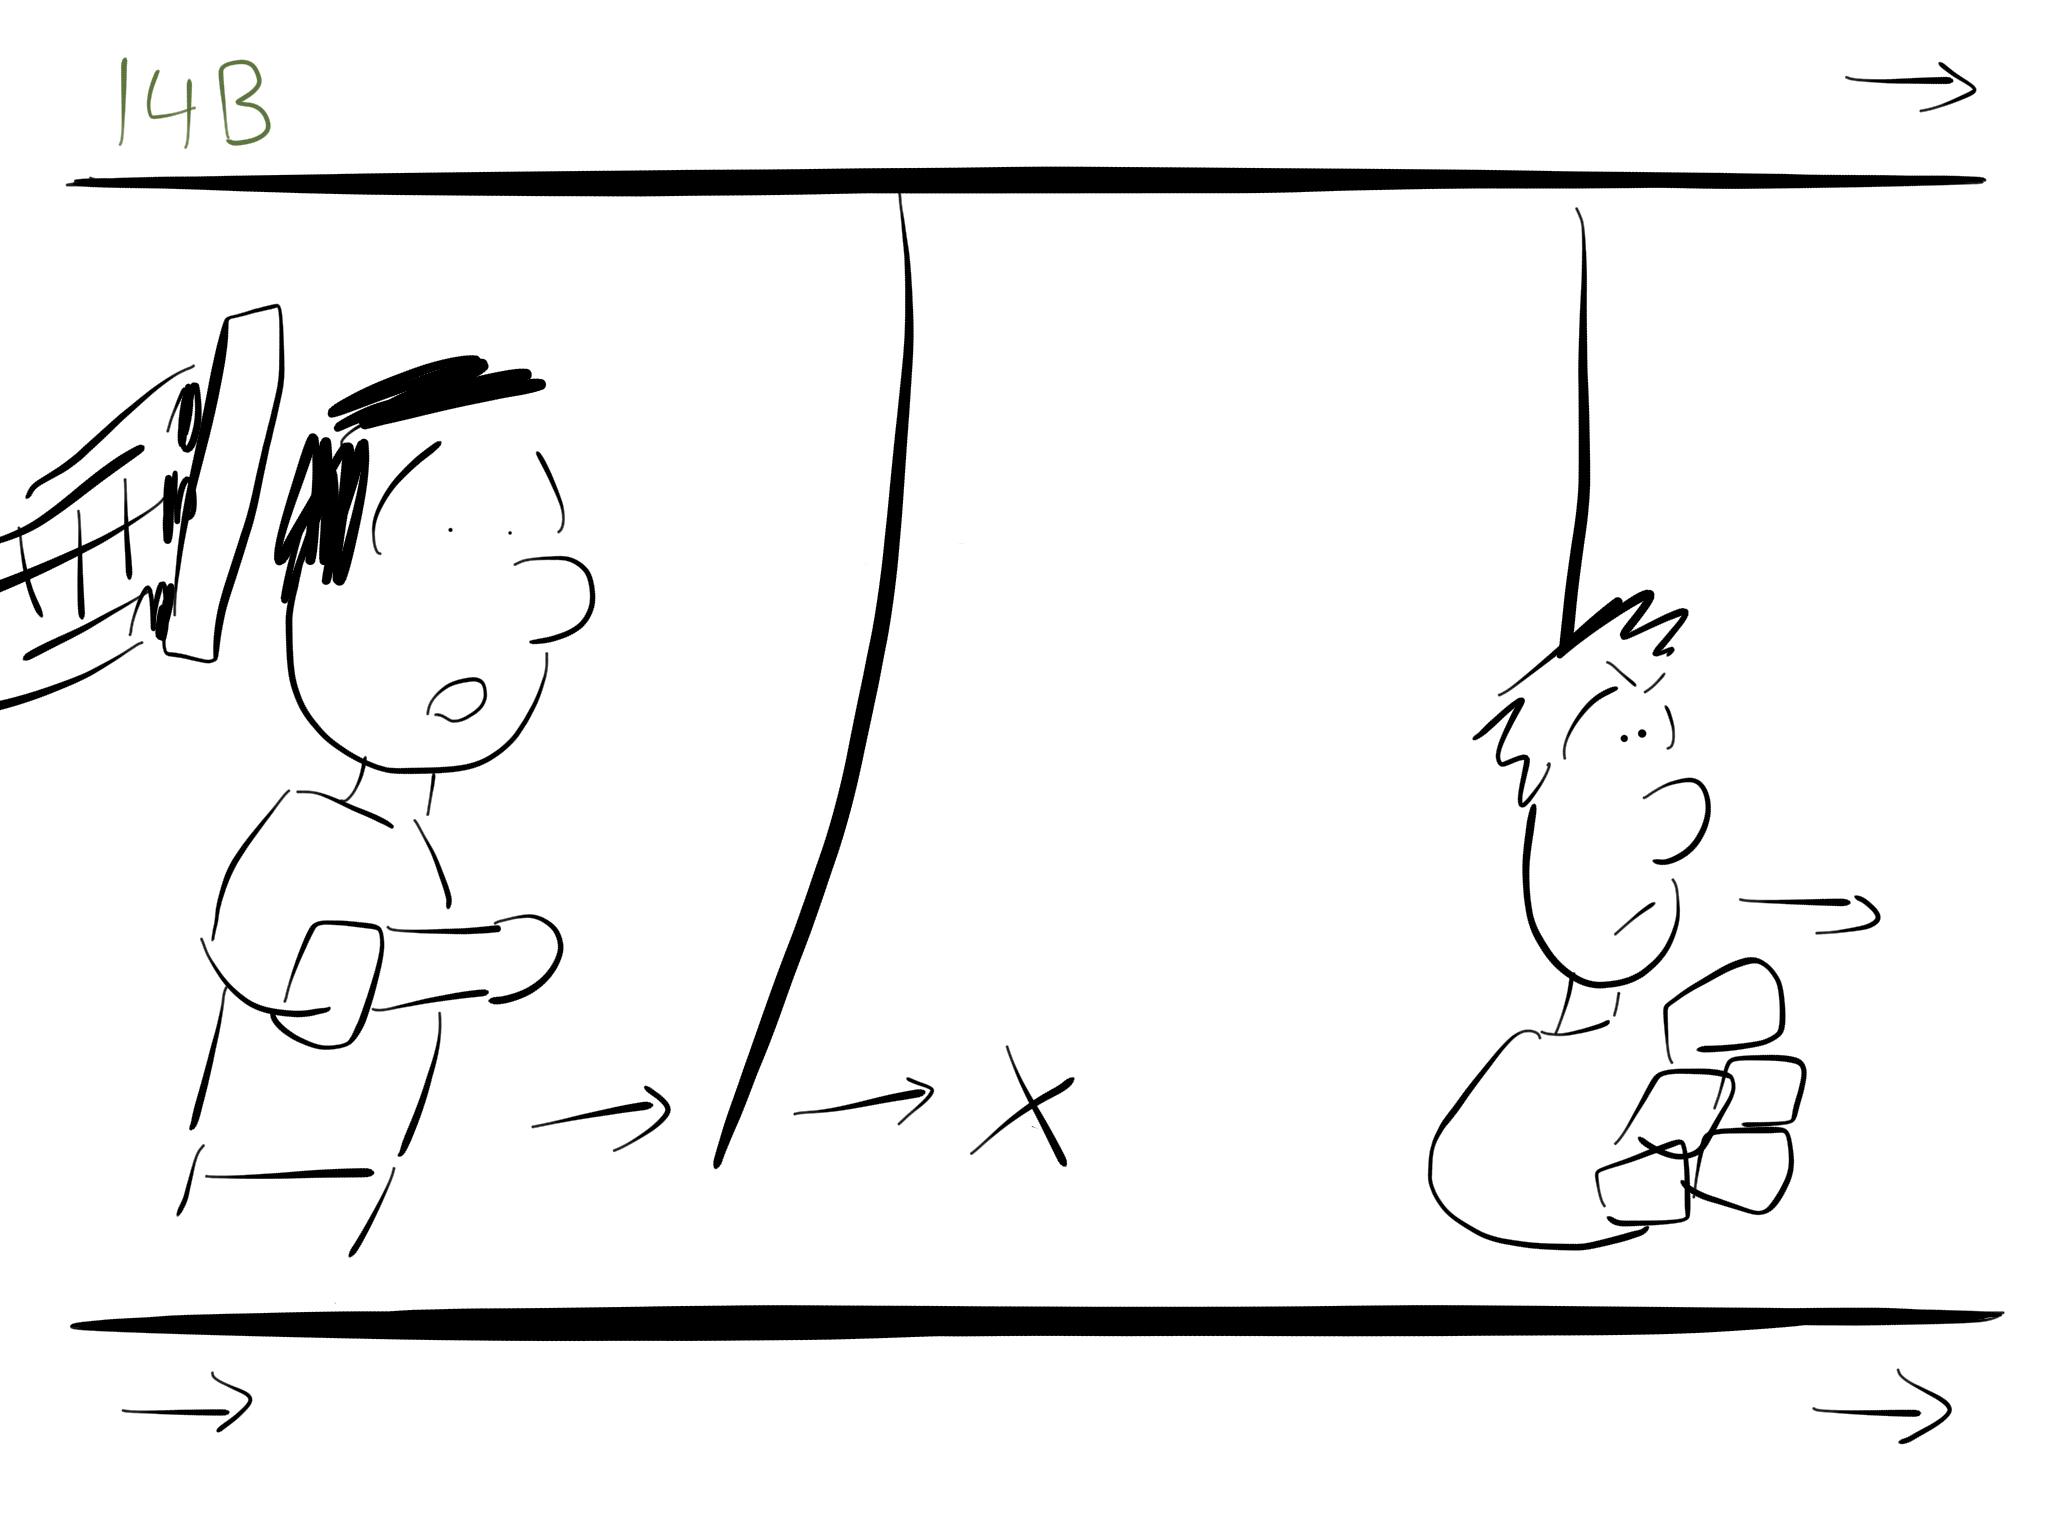 BDF_Storyboards_54.jpg